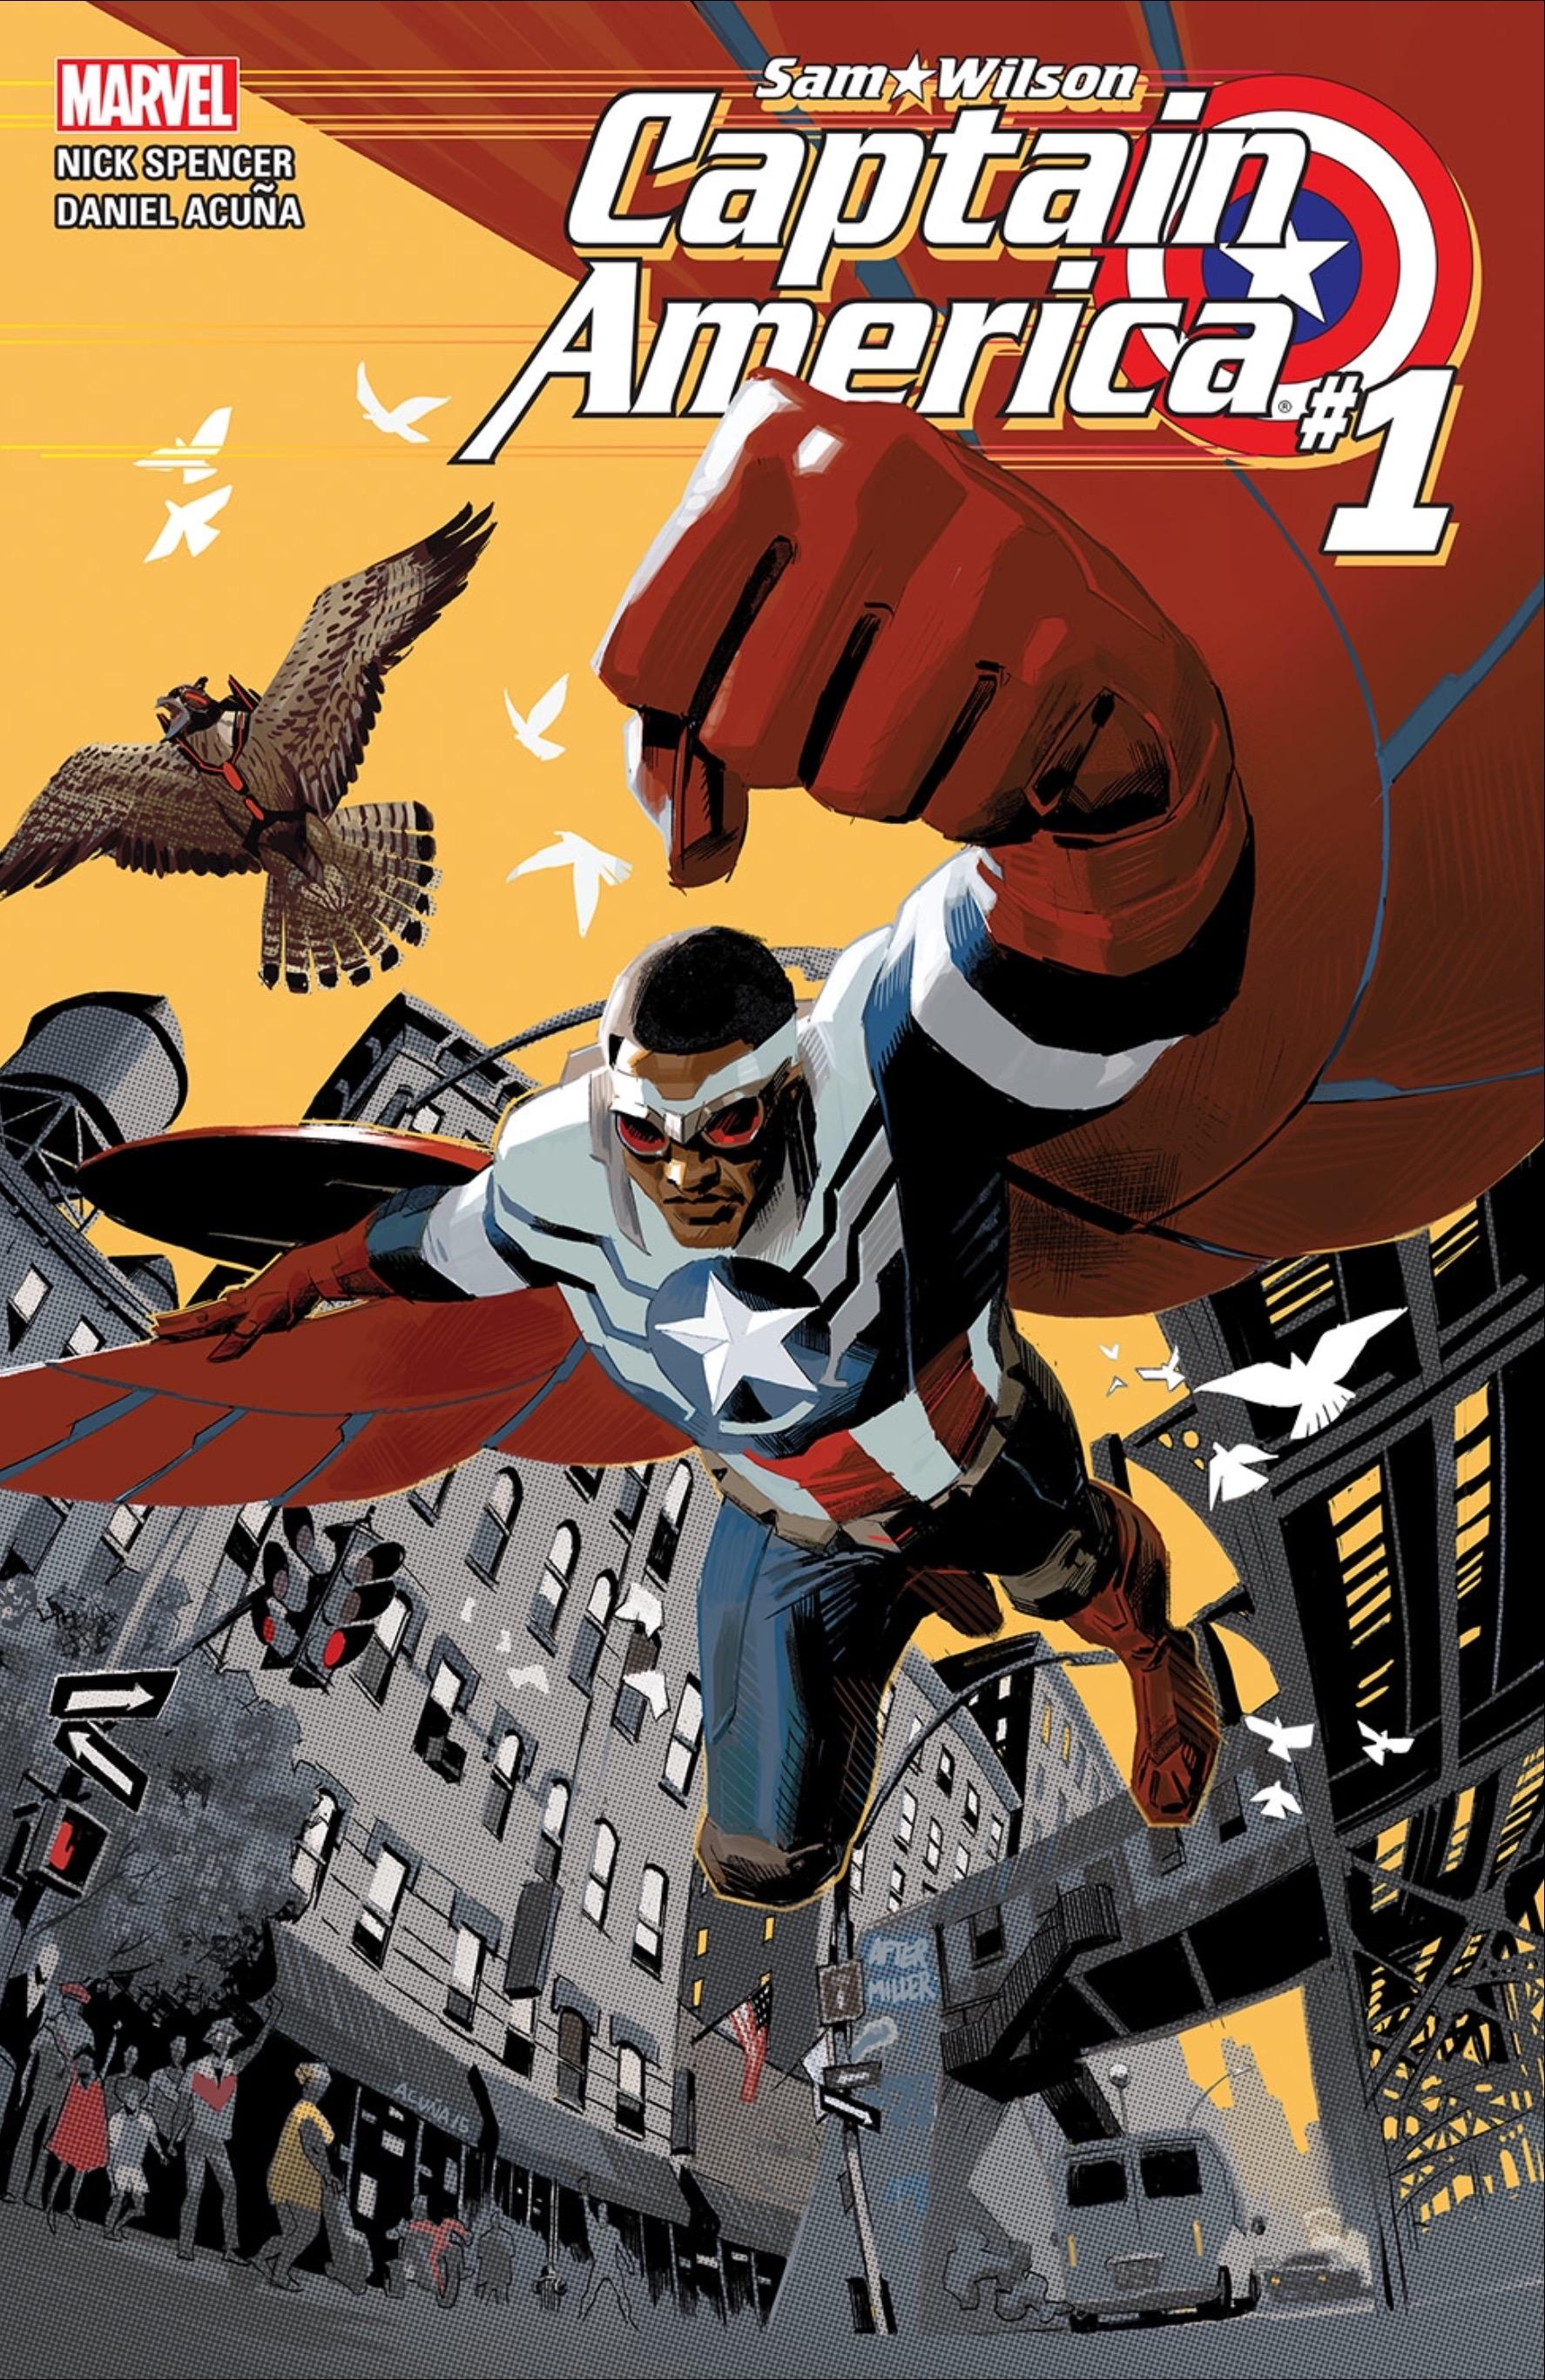 Captain America: Sam Wilson #1 cover